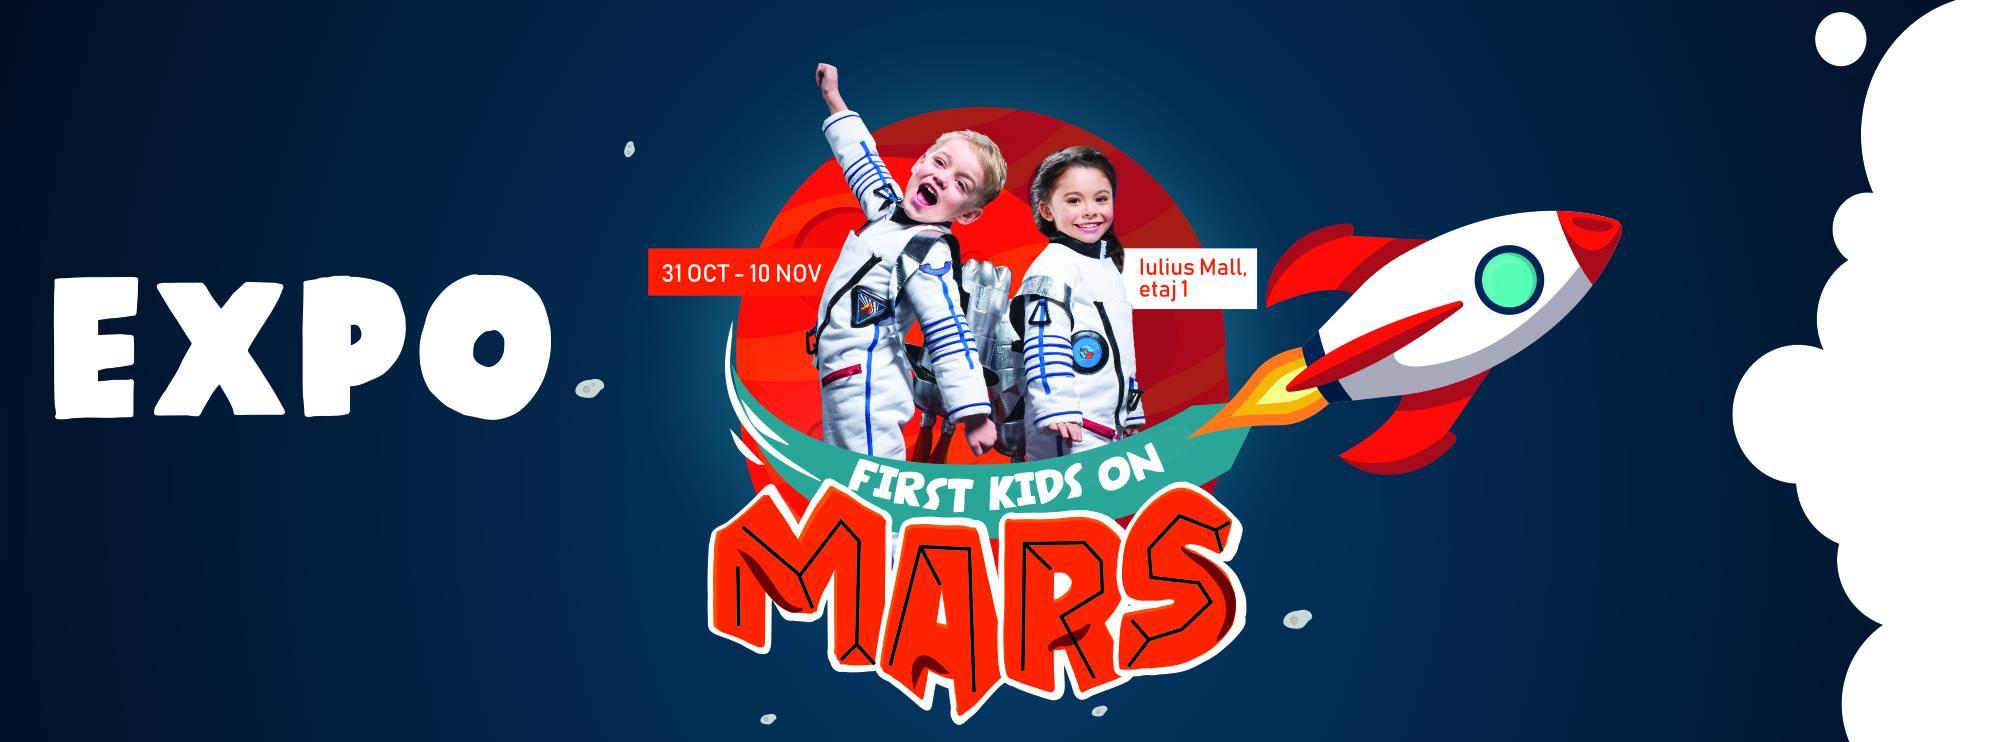 First Kids on Mars